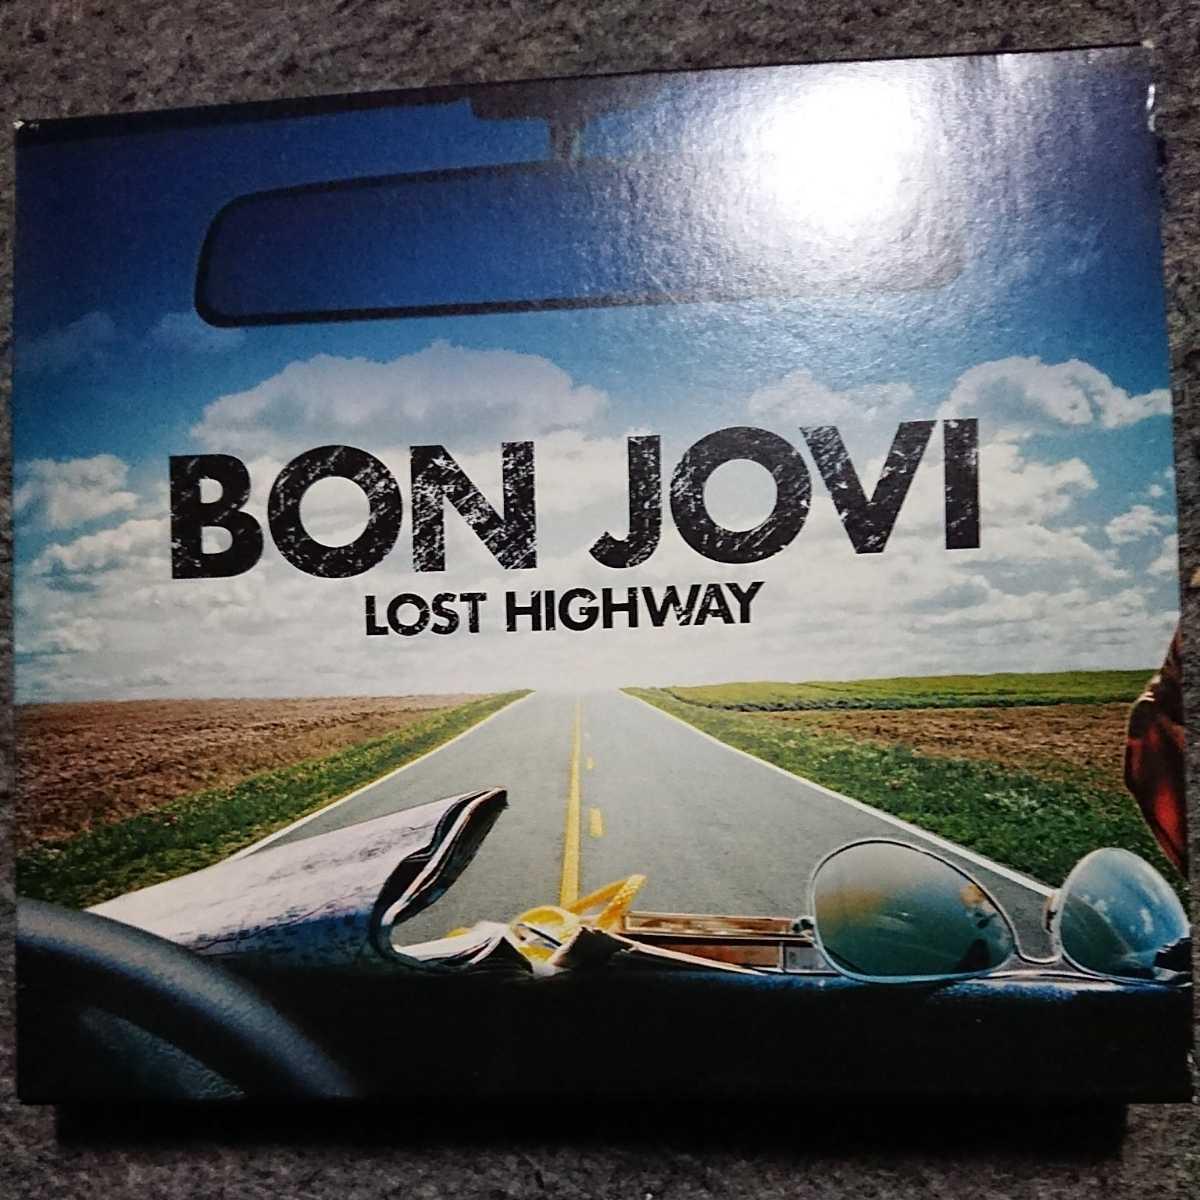 BON JOVI/LOST HIGHWAY 国内盤 初回限定盤CD+DVD 2枚組 表紙(歌詞カード)欠品 ボン・ジョヴィ ロストハイウェイ